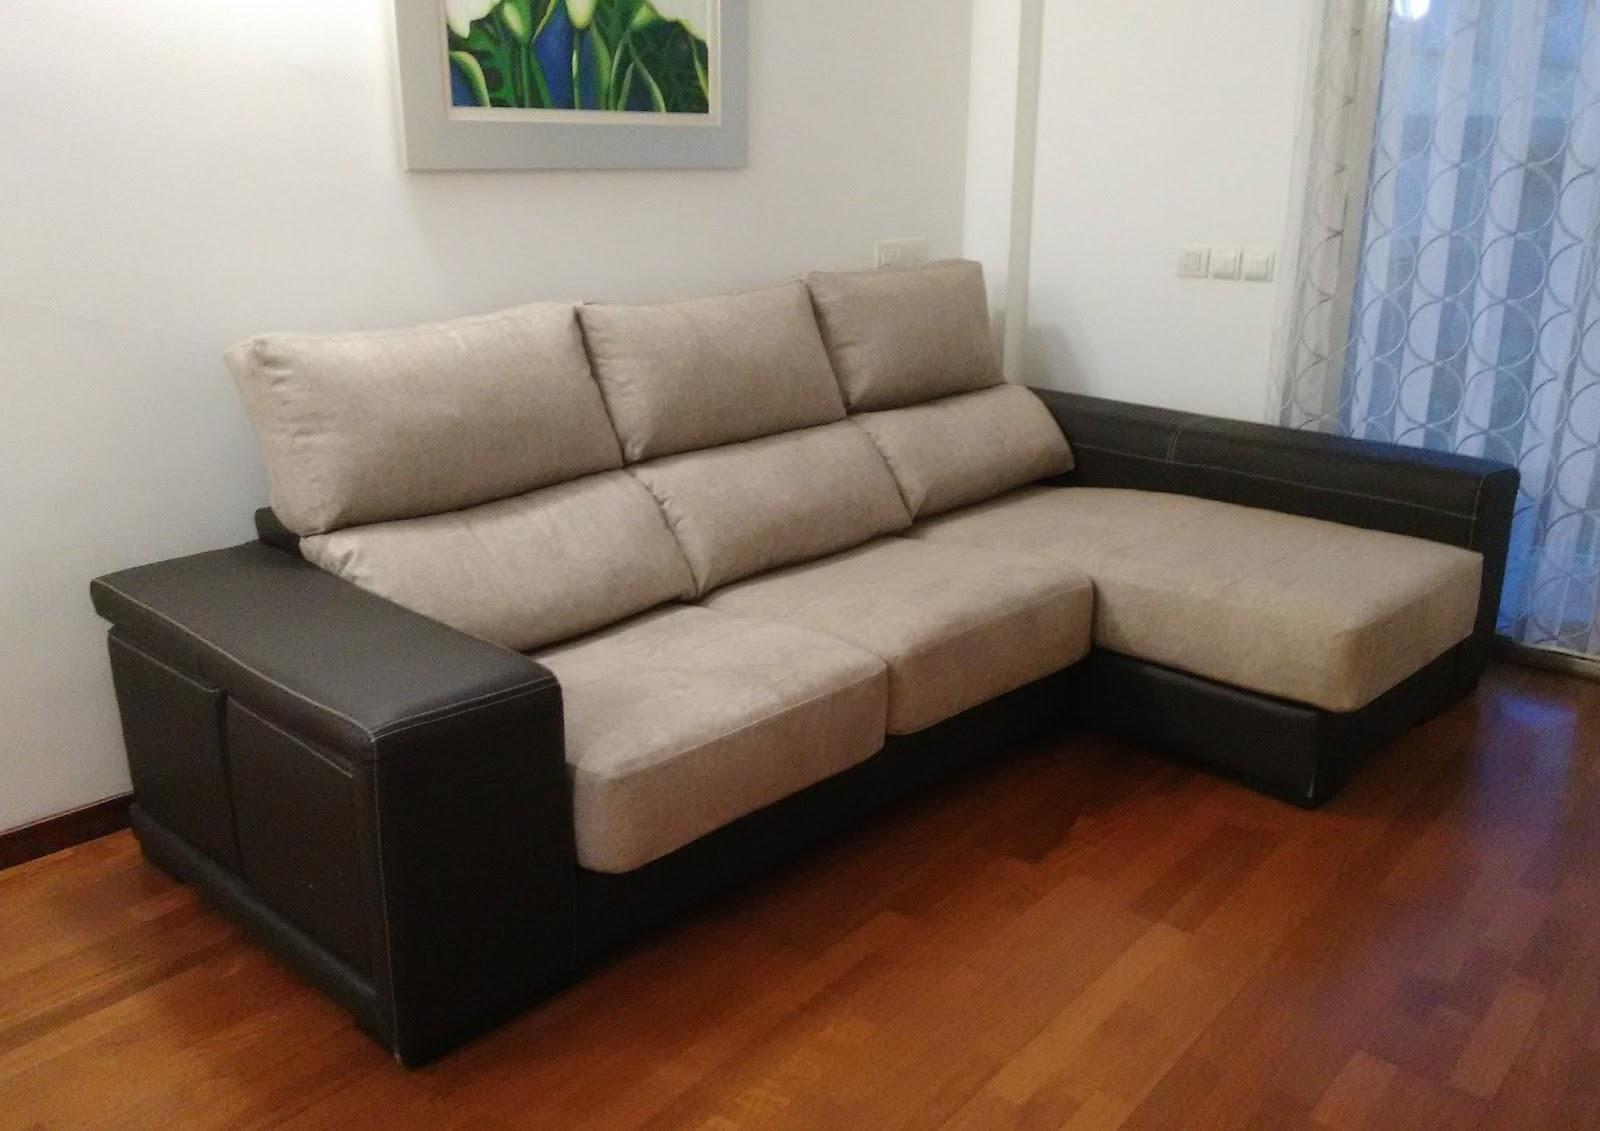 Fundas de sof a la carta sofa de poli piel pelado - Sofa de piel ...